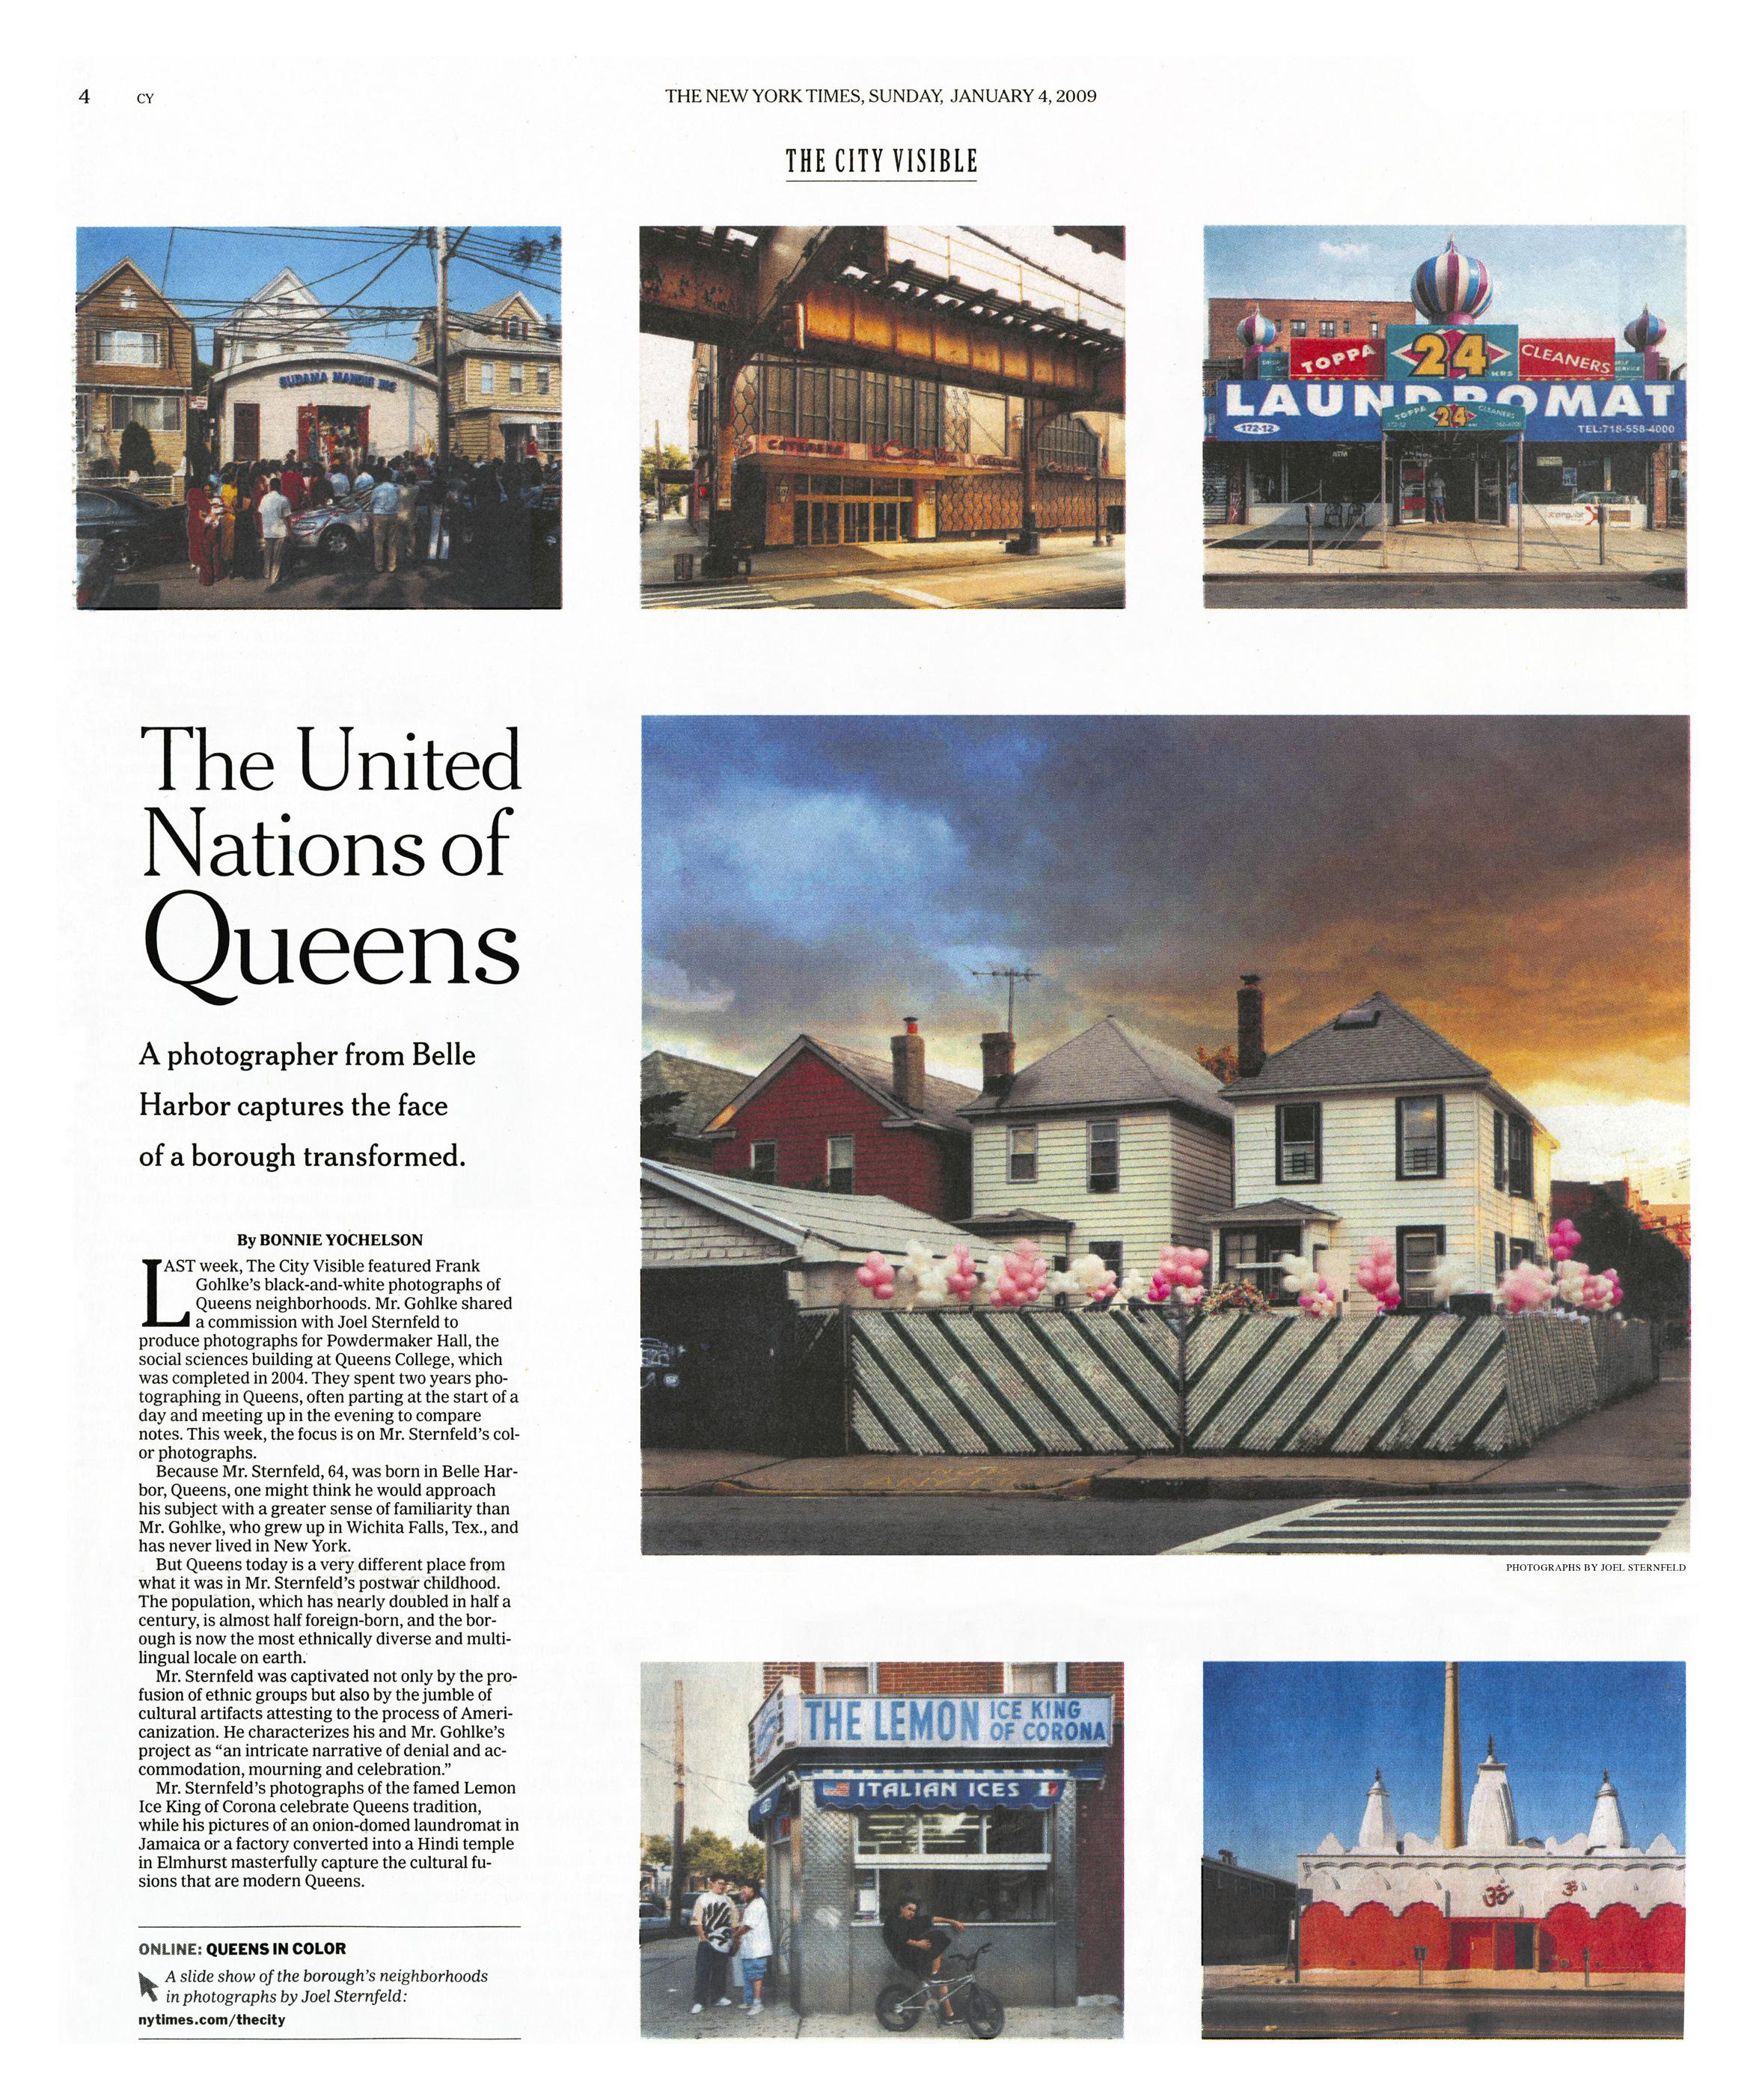 20090100_The-New-York-Times.jpg